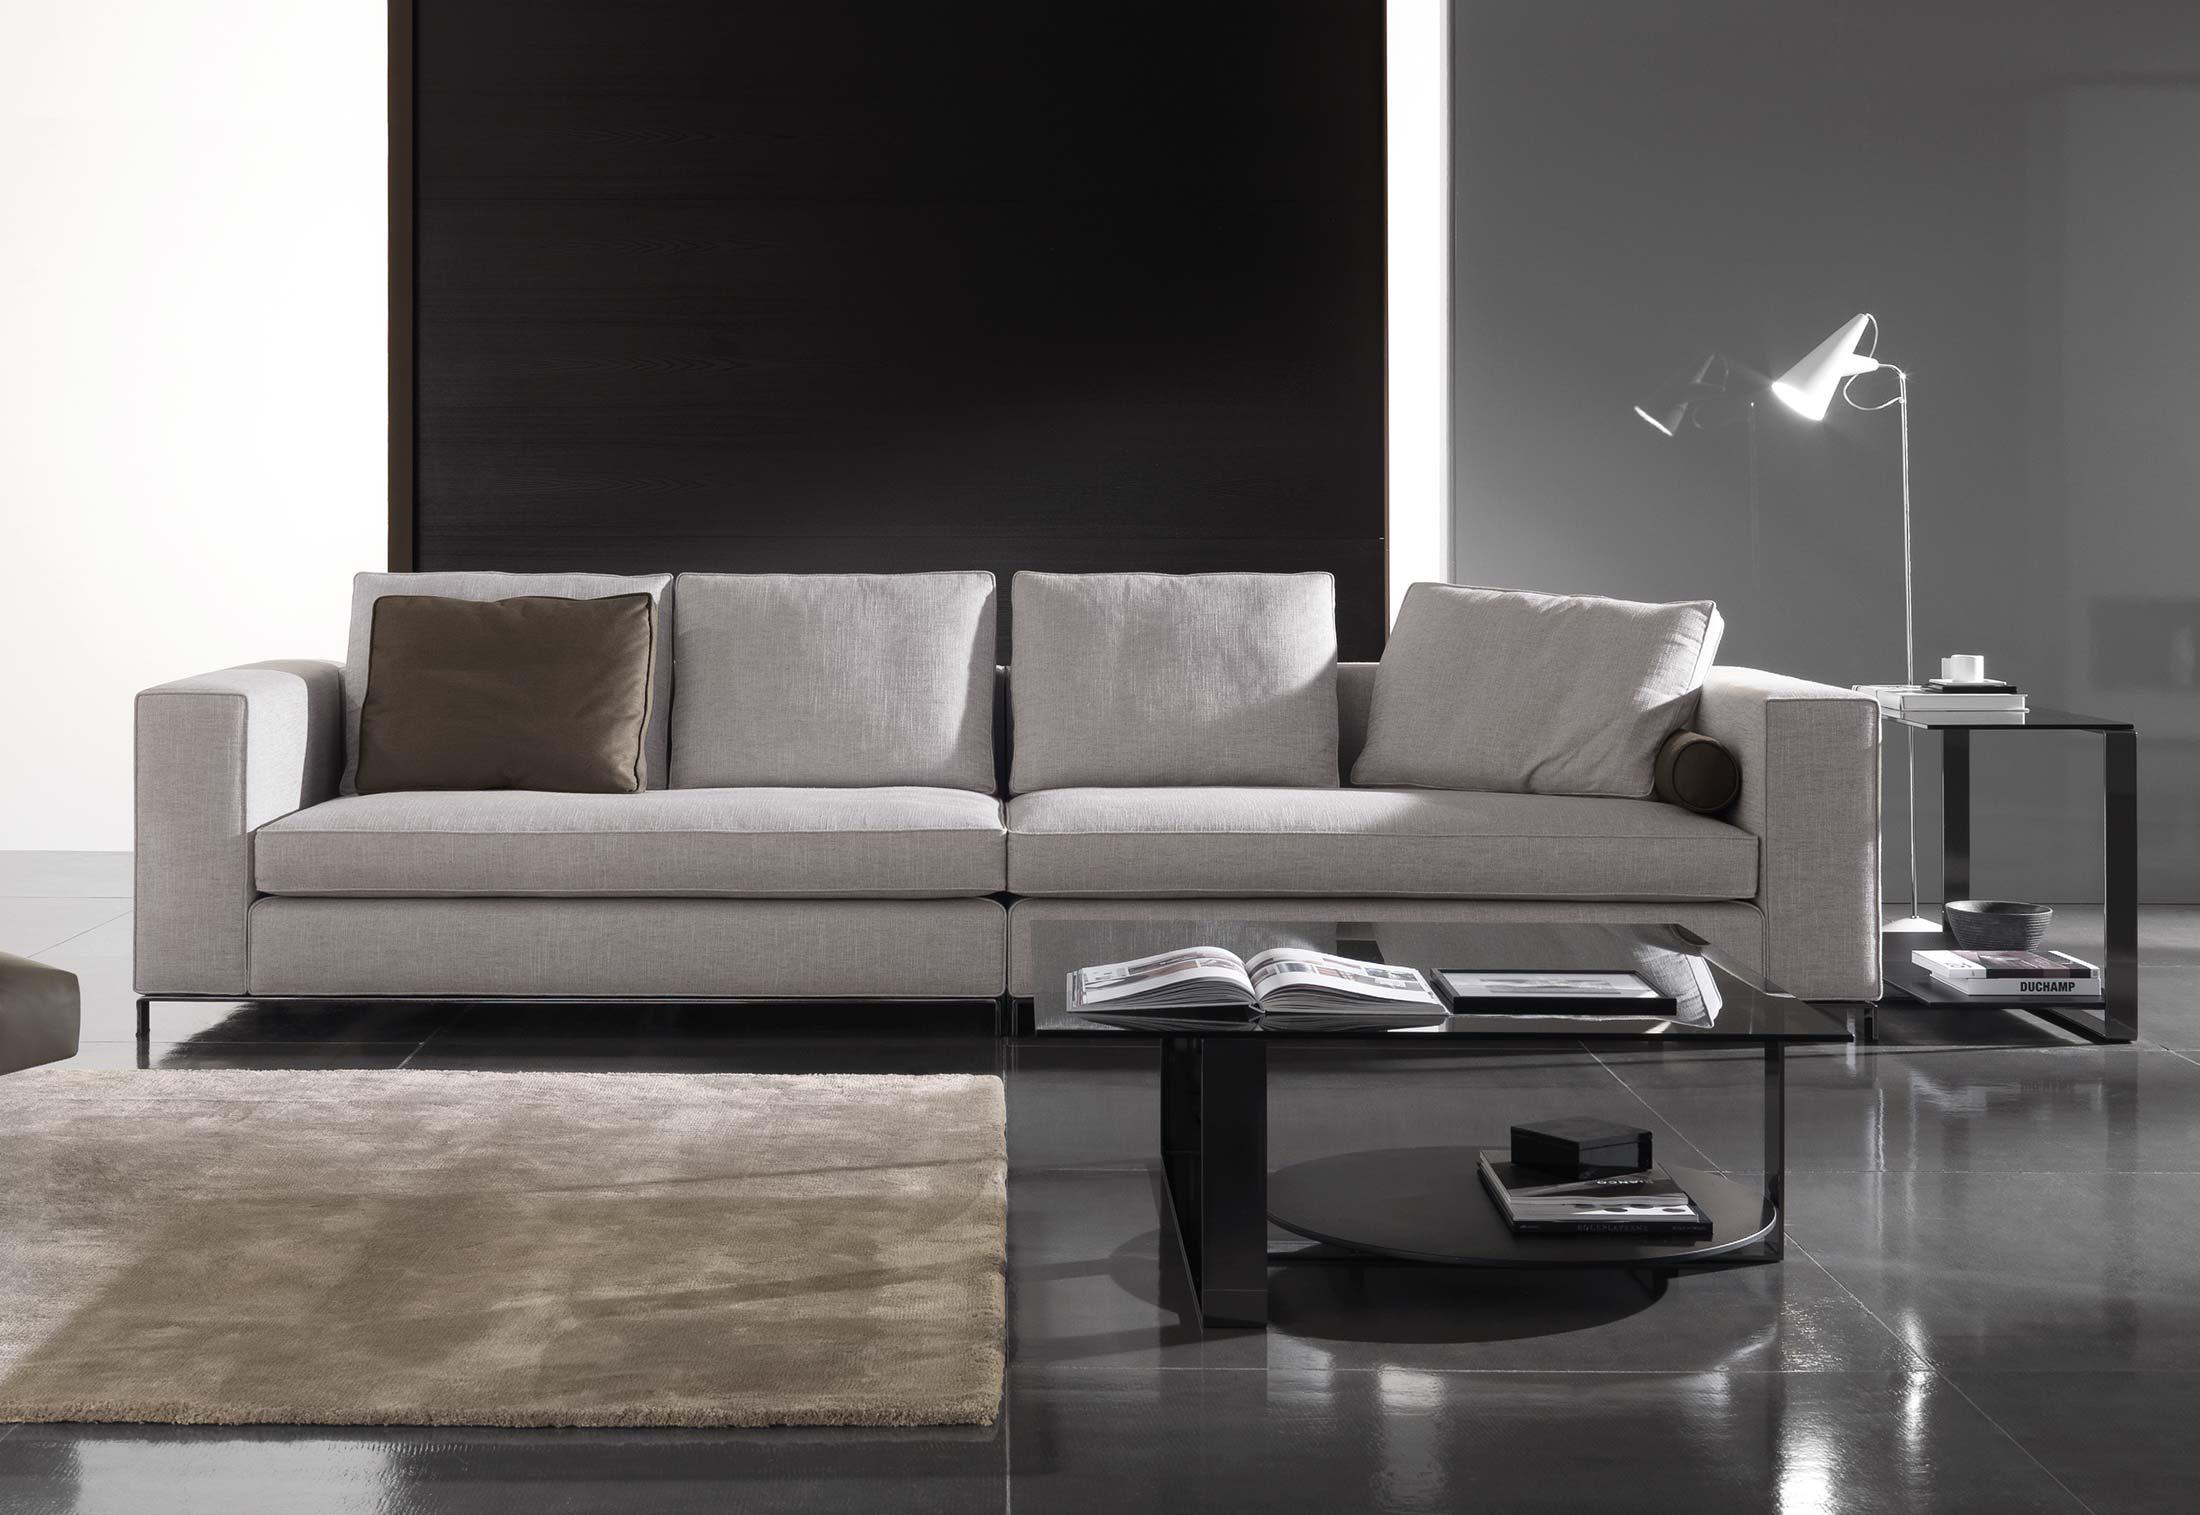 minotti williams sofa model minotti williams sofa cgtrader. Black Bedroom Furniture Sets. Home Design Ideas